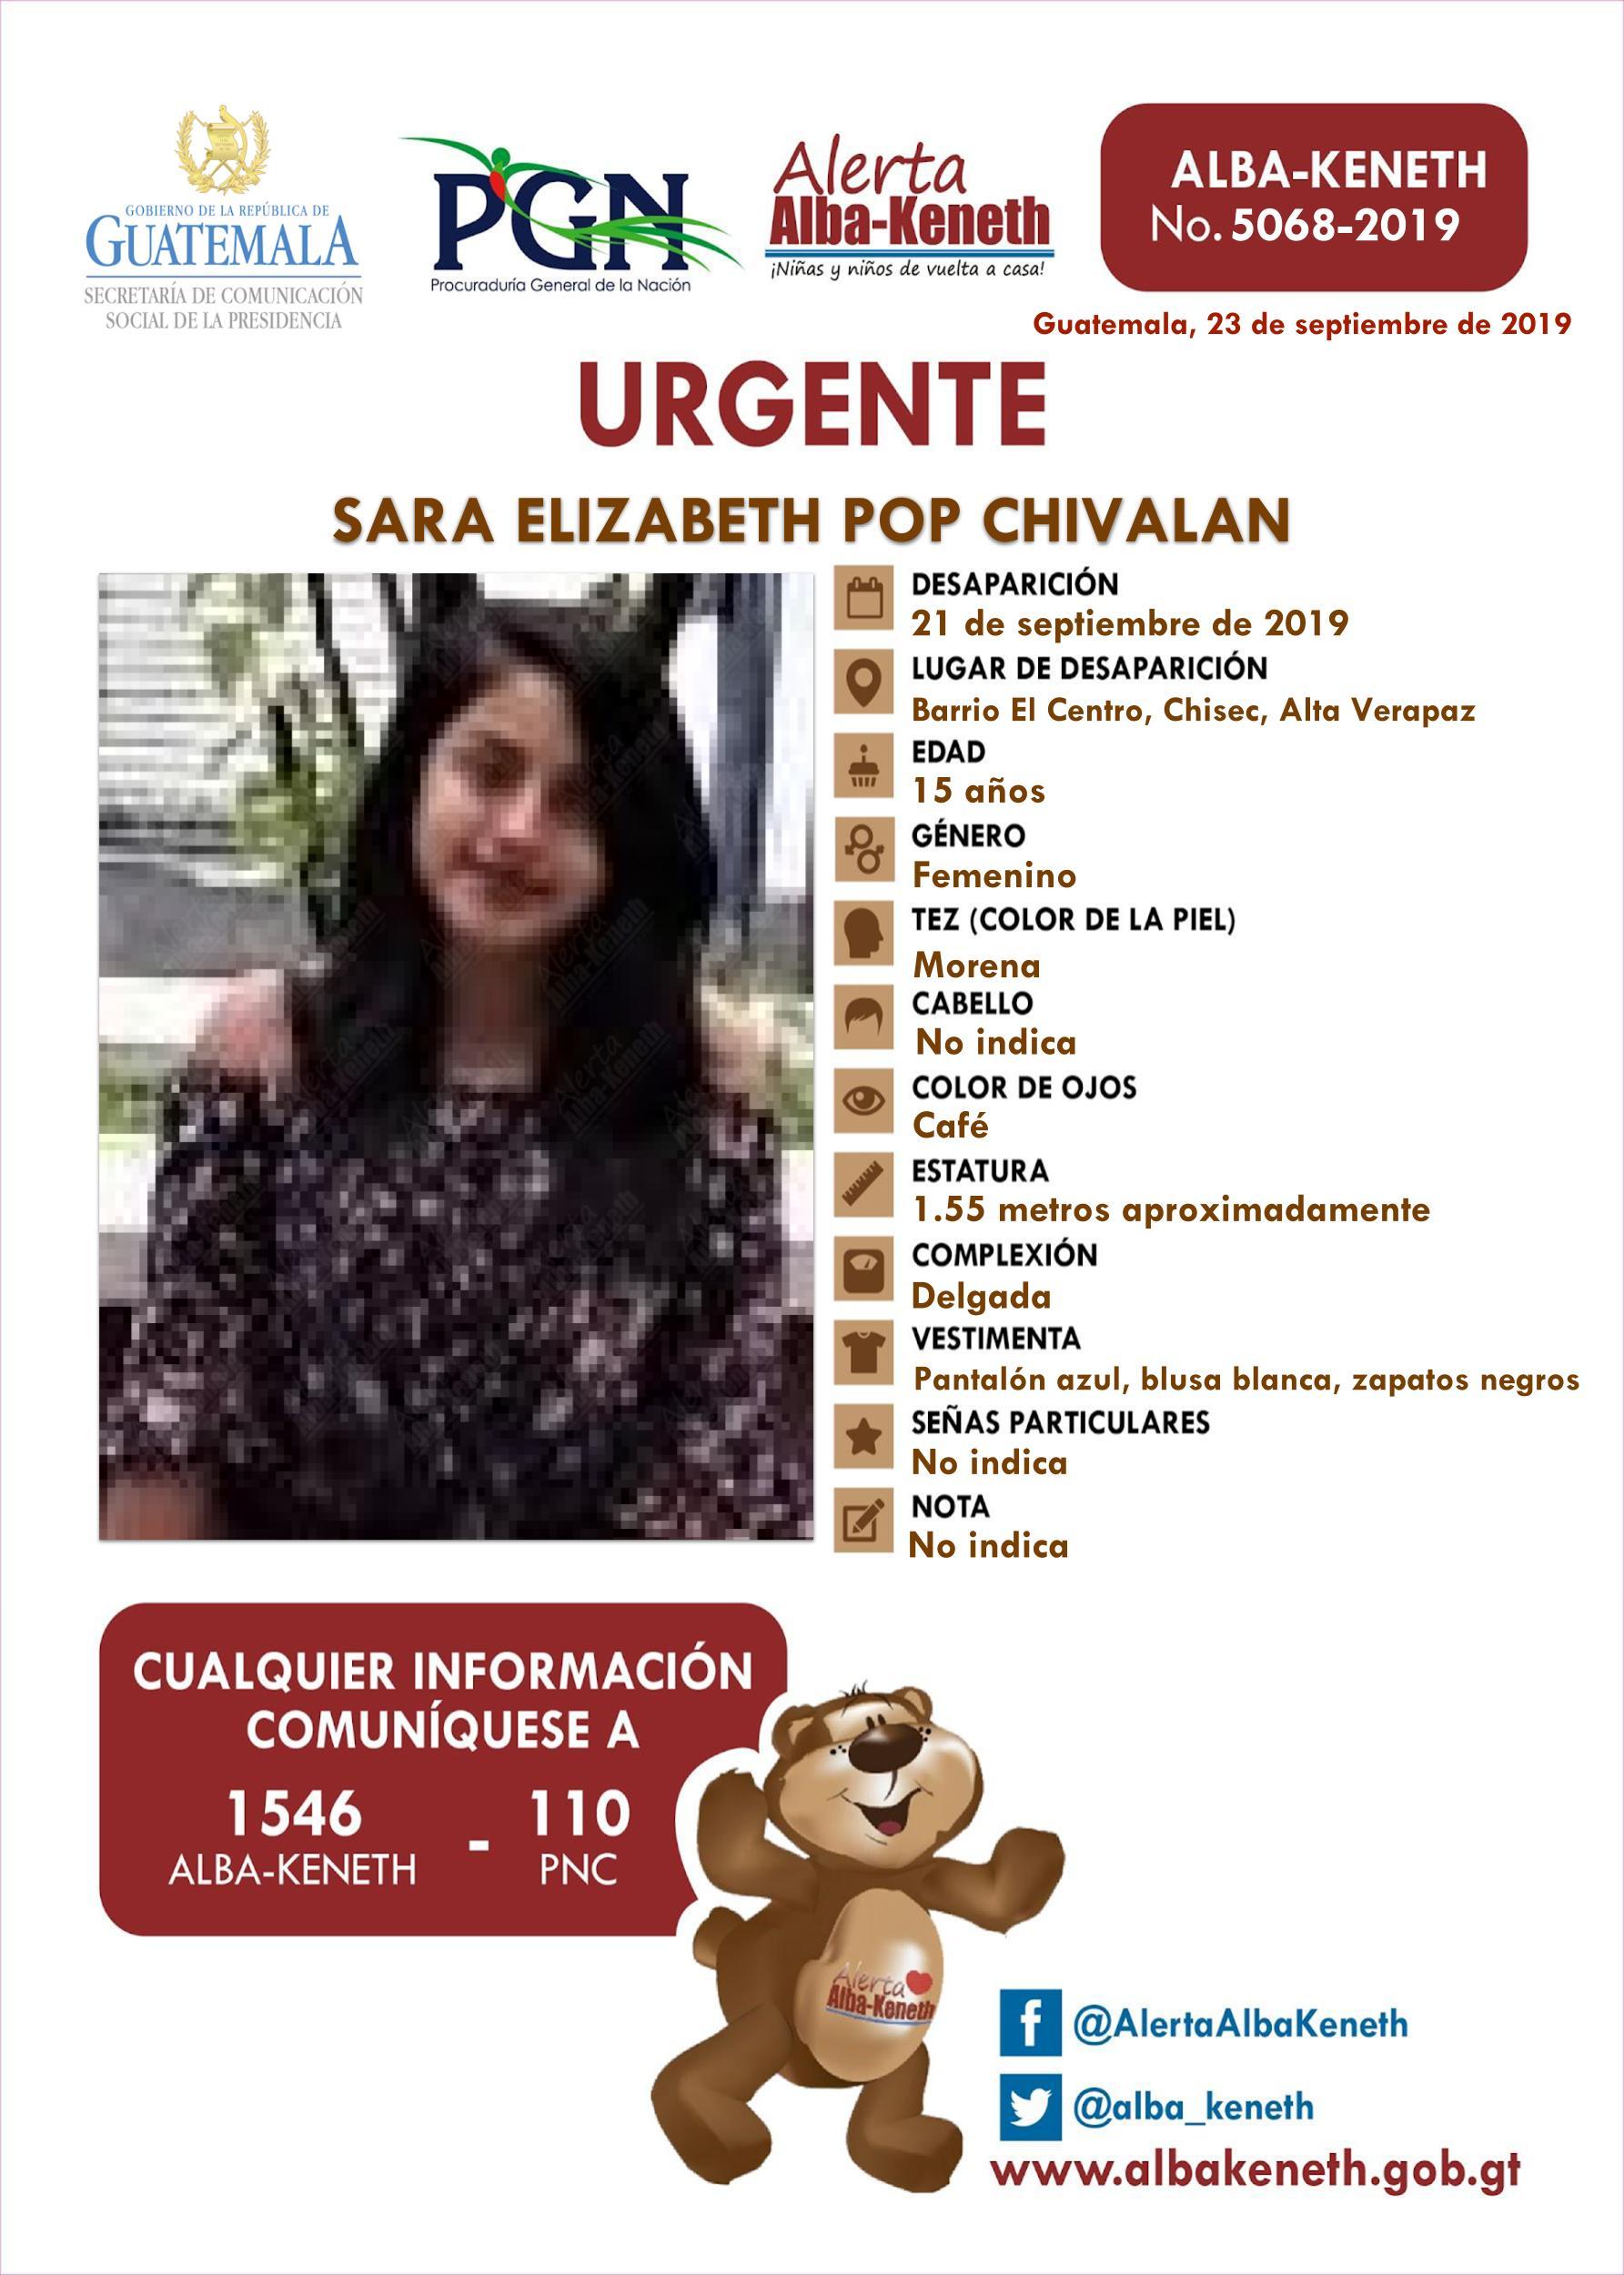 Sara Elizabeth Pop Chivalan